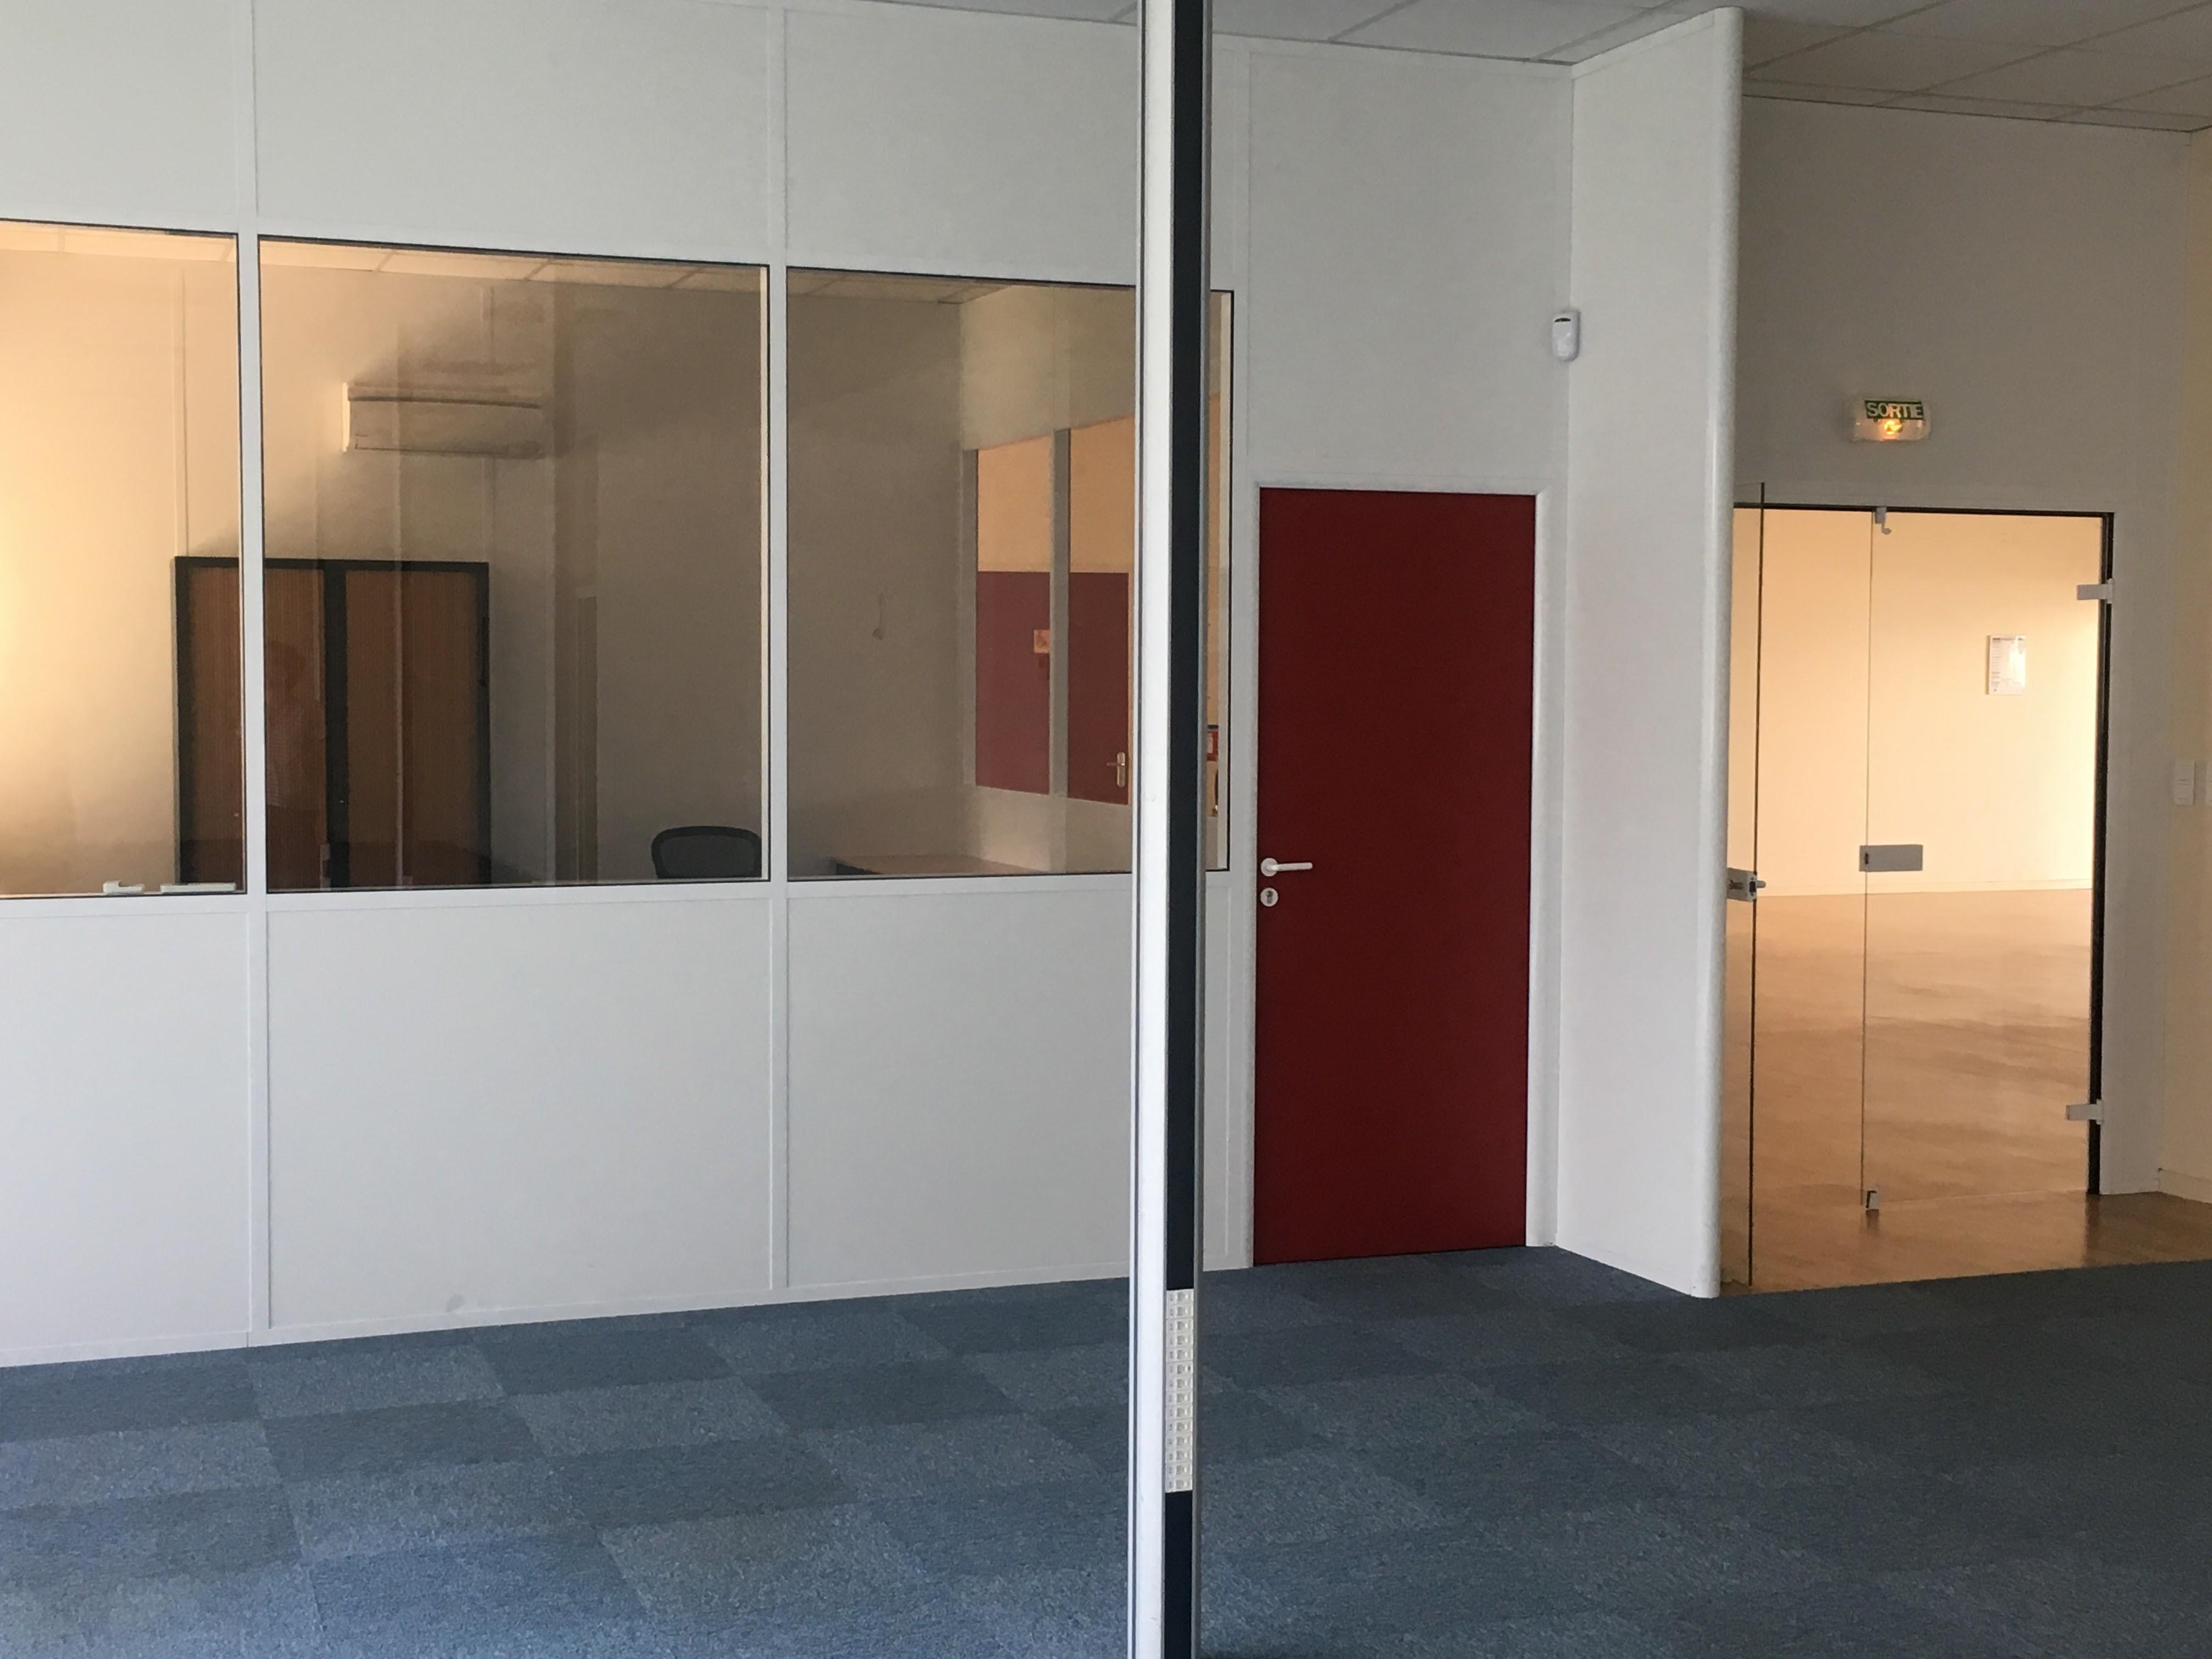 bureaux aménagés